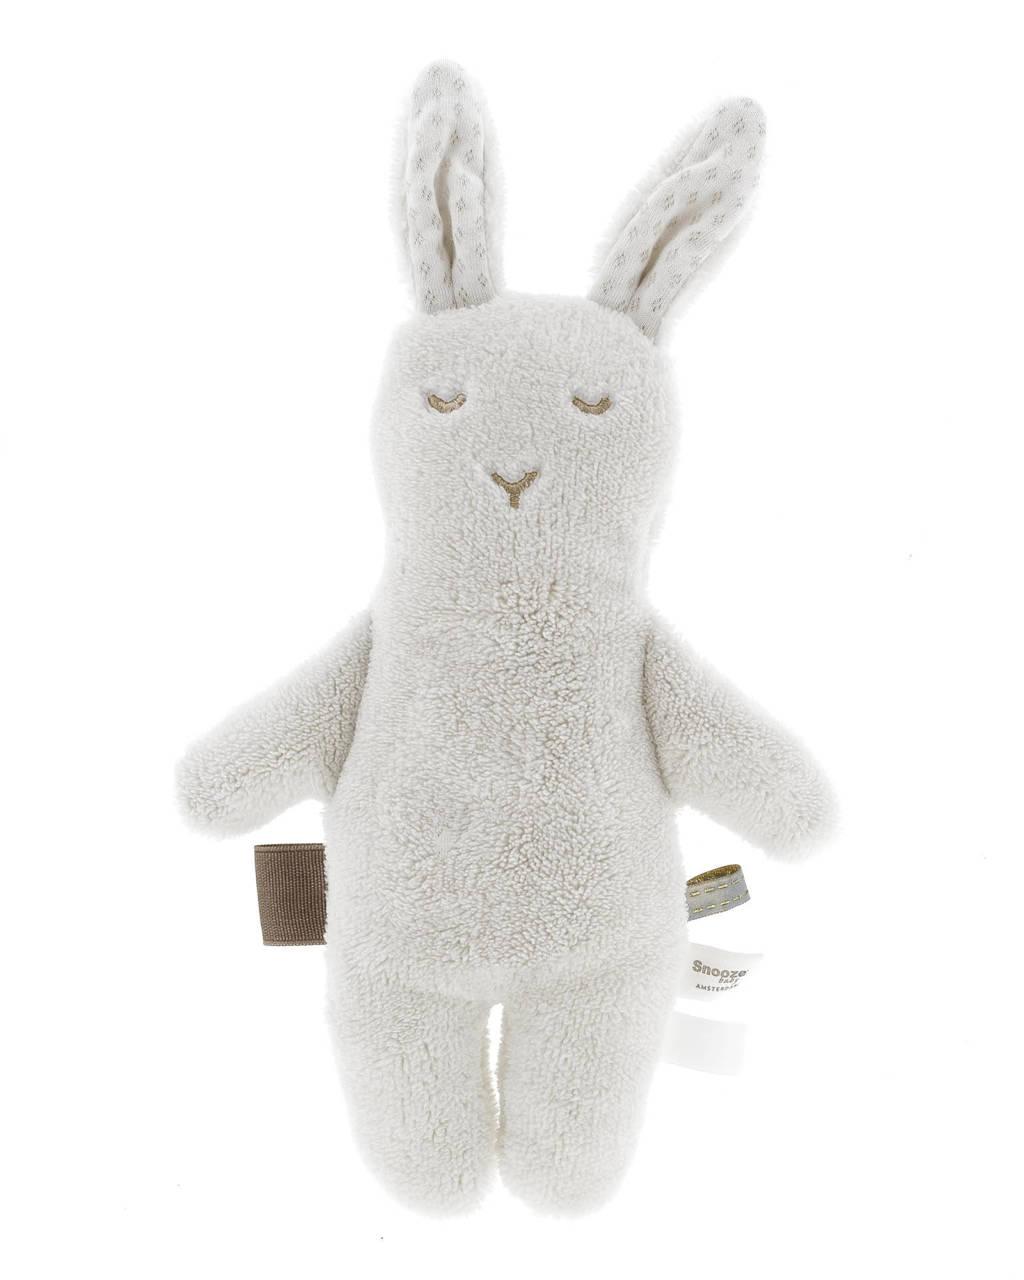 Snoozebaby konijn knuffel 30 cm, Grijs